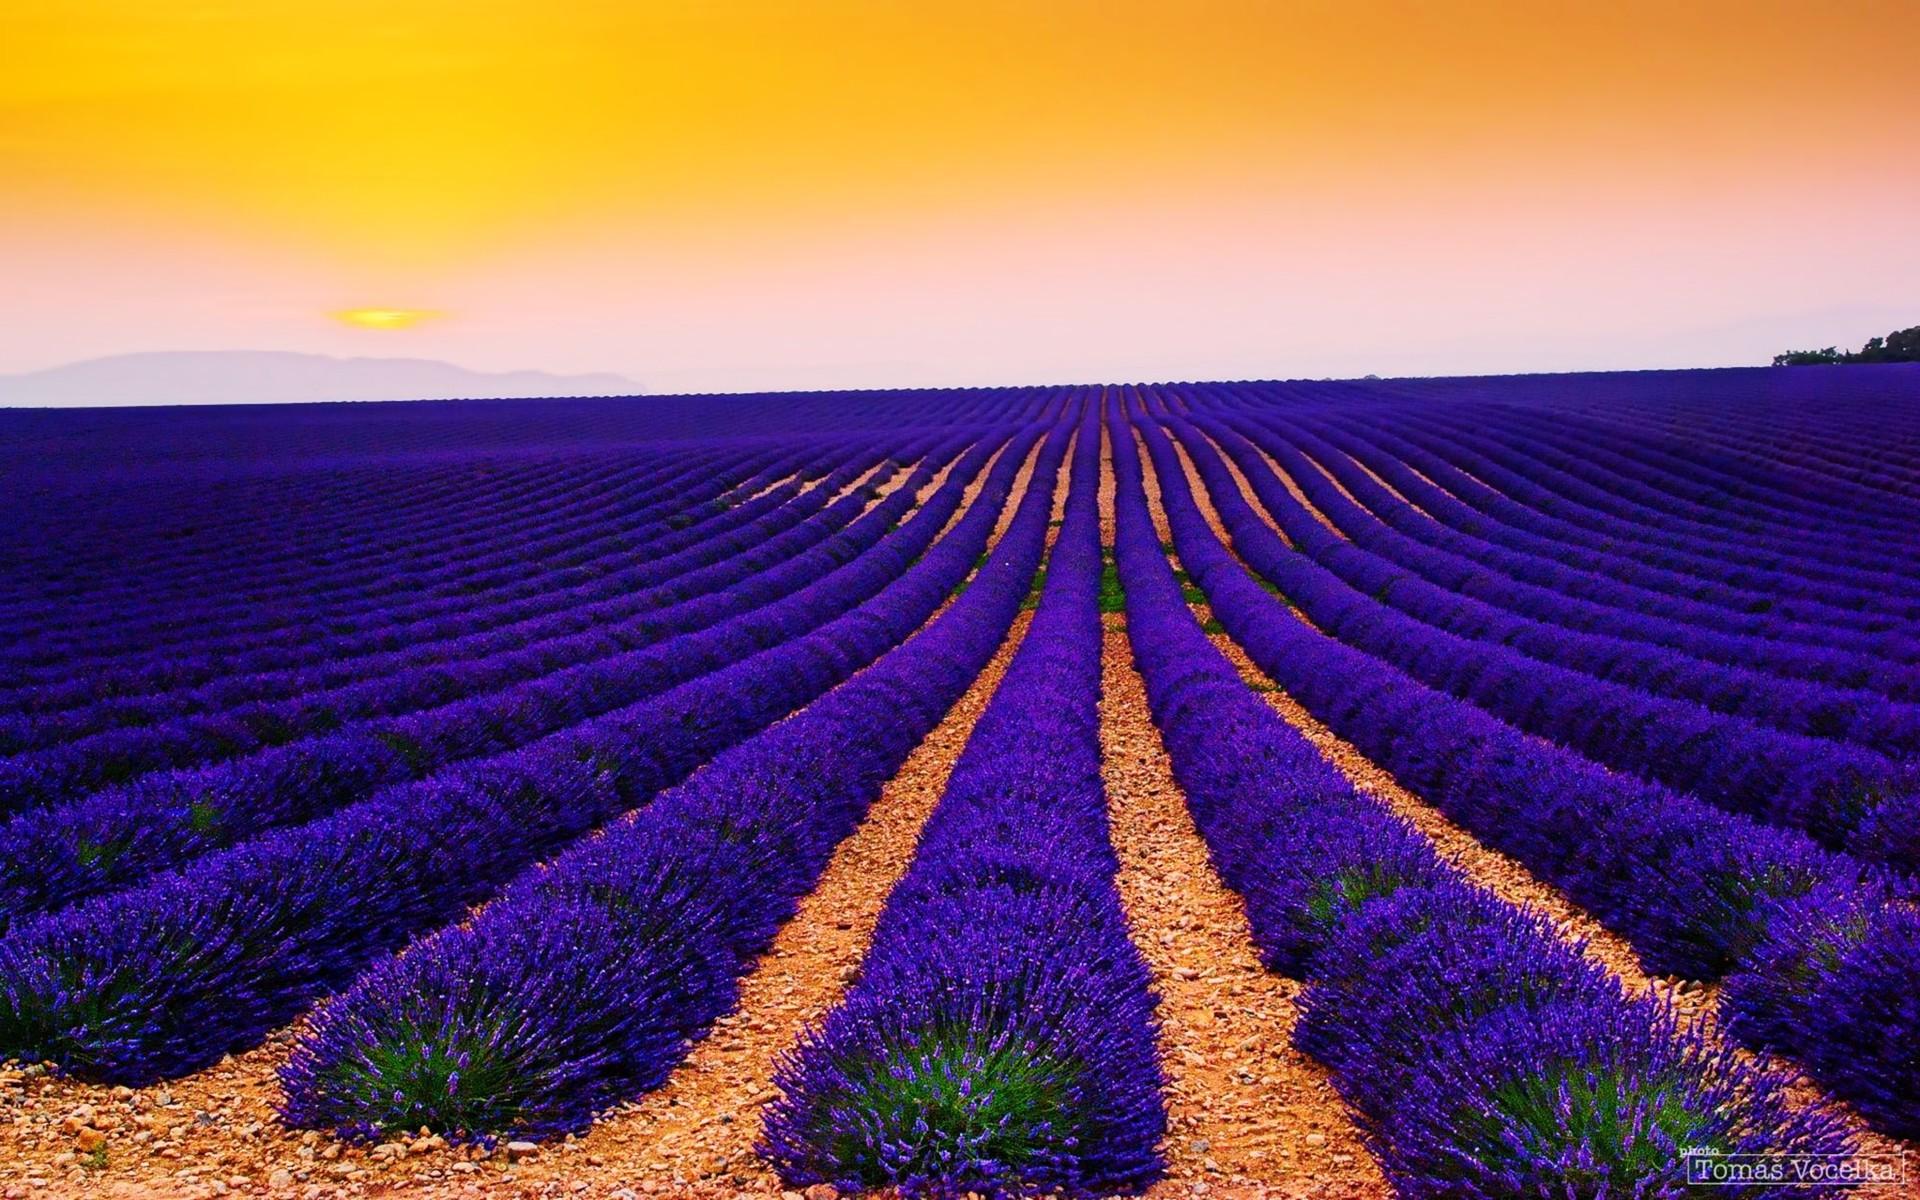 Purple Lavender & Orange Sky wallpapers and stock photos